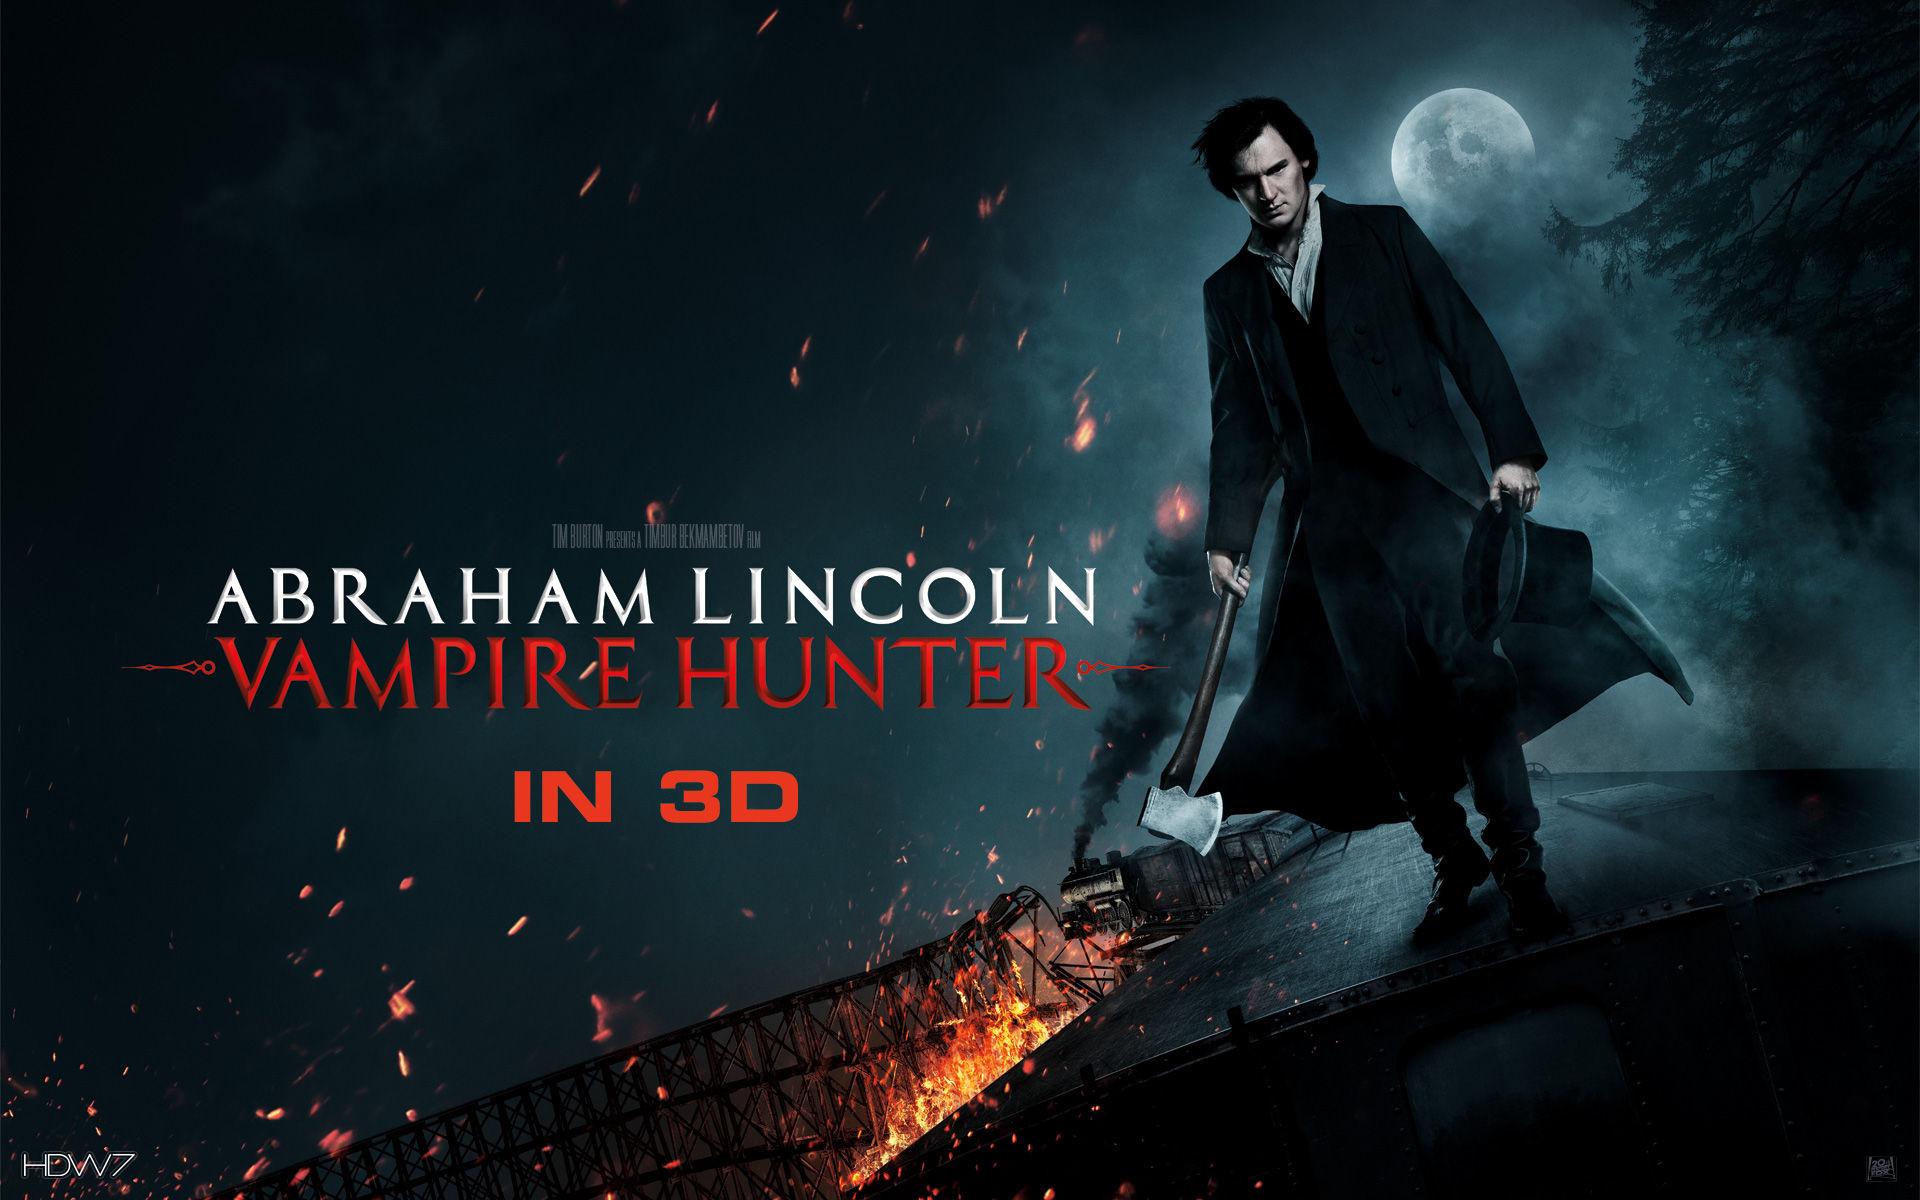 2012 action fantasy horror movie